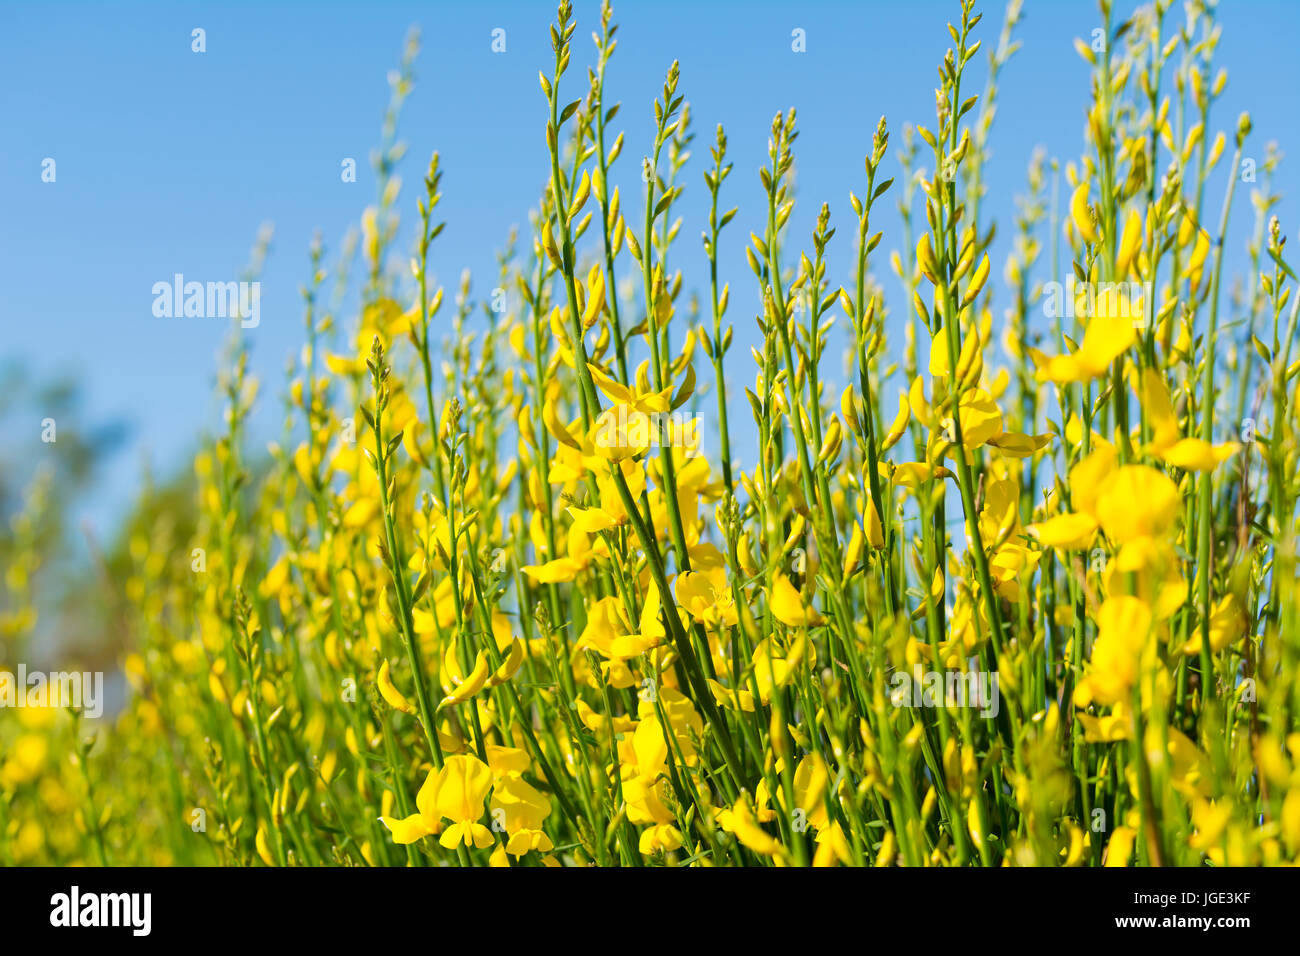 Spanish broom  (Spartium junceum), AKA Weaver's broom growing in Summer in West Sussex, England, UK. - Stock Image